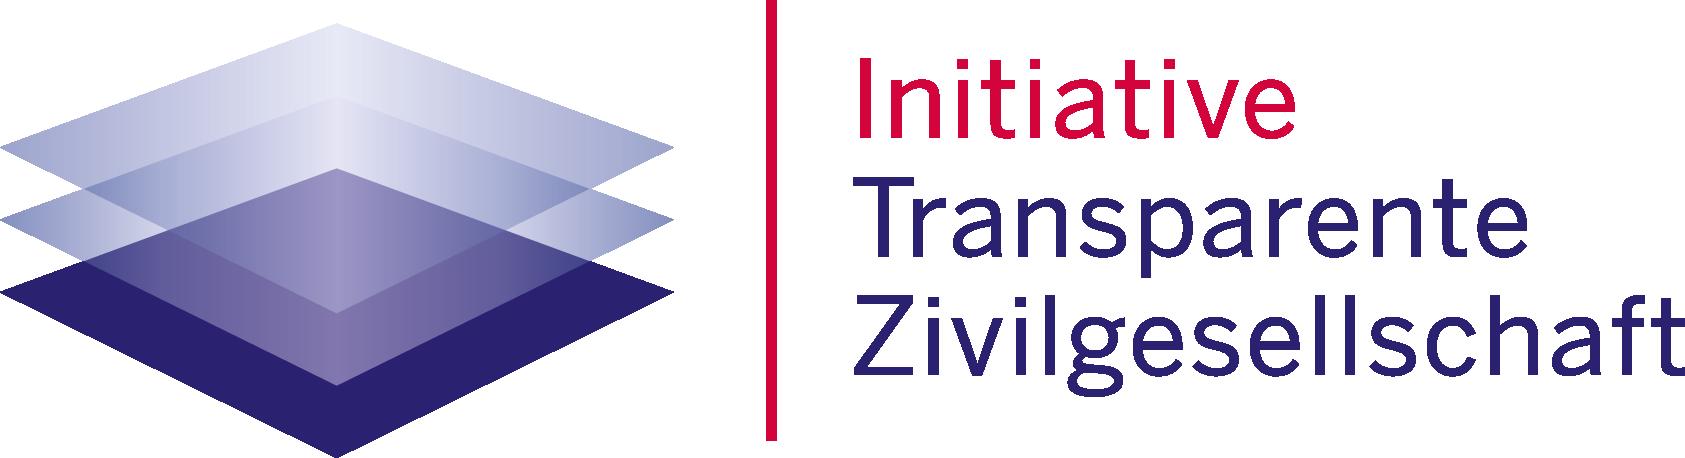 Logo Transparente Zivilgesellschaft - Jetzt spenden